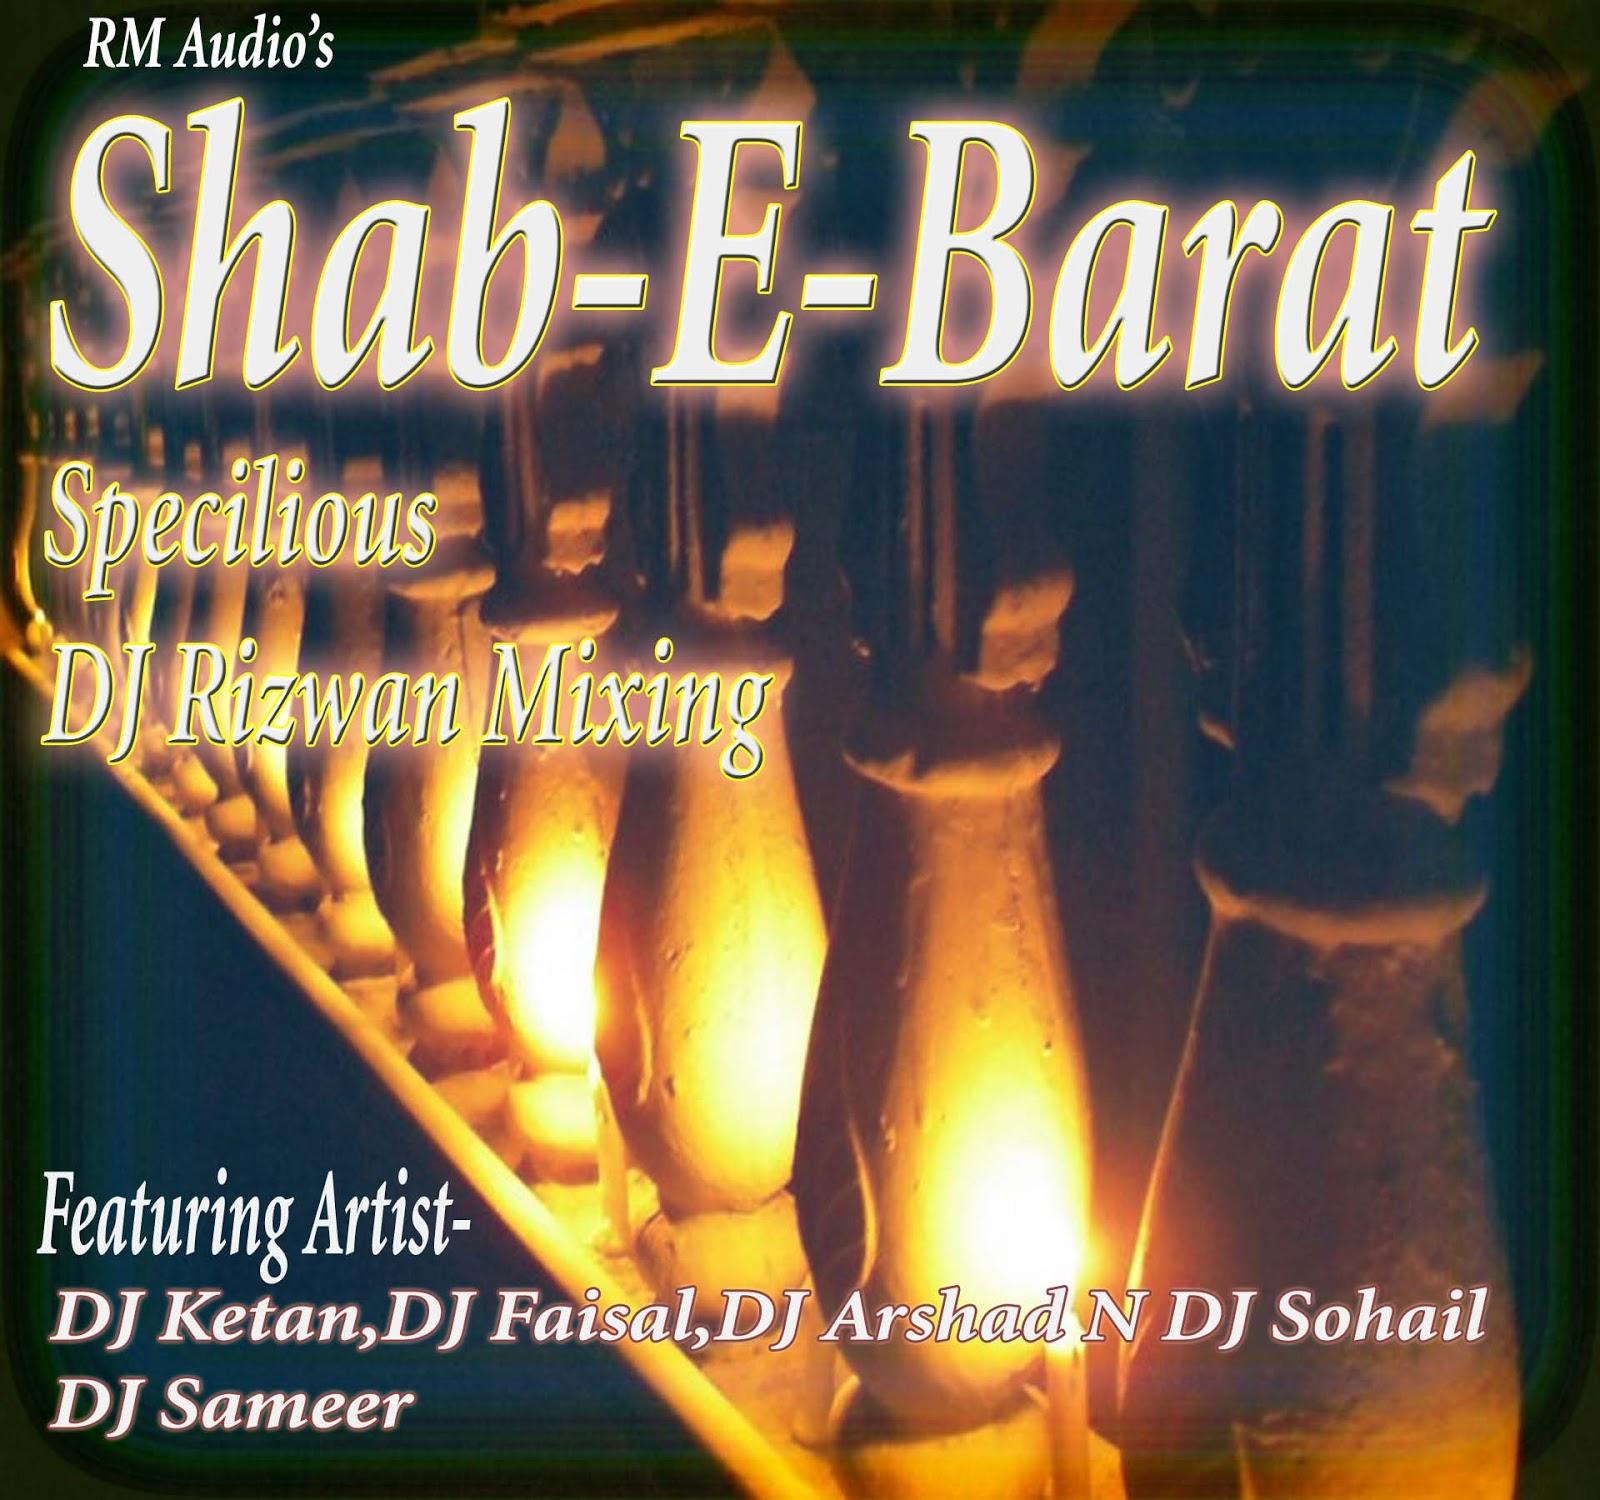 DJ Rizwan Mixing: **Shab-E-Barat Specilious**